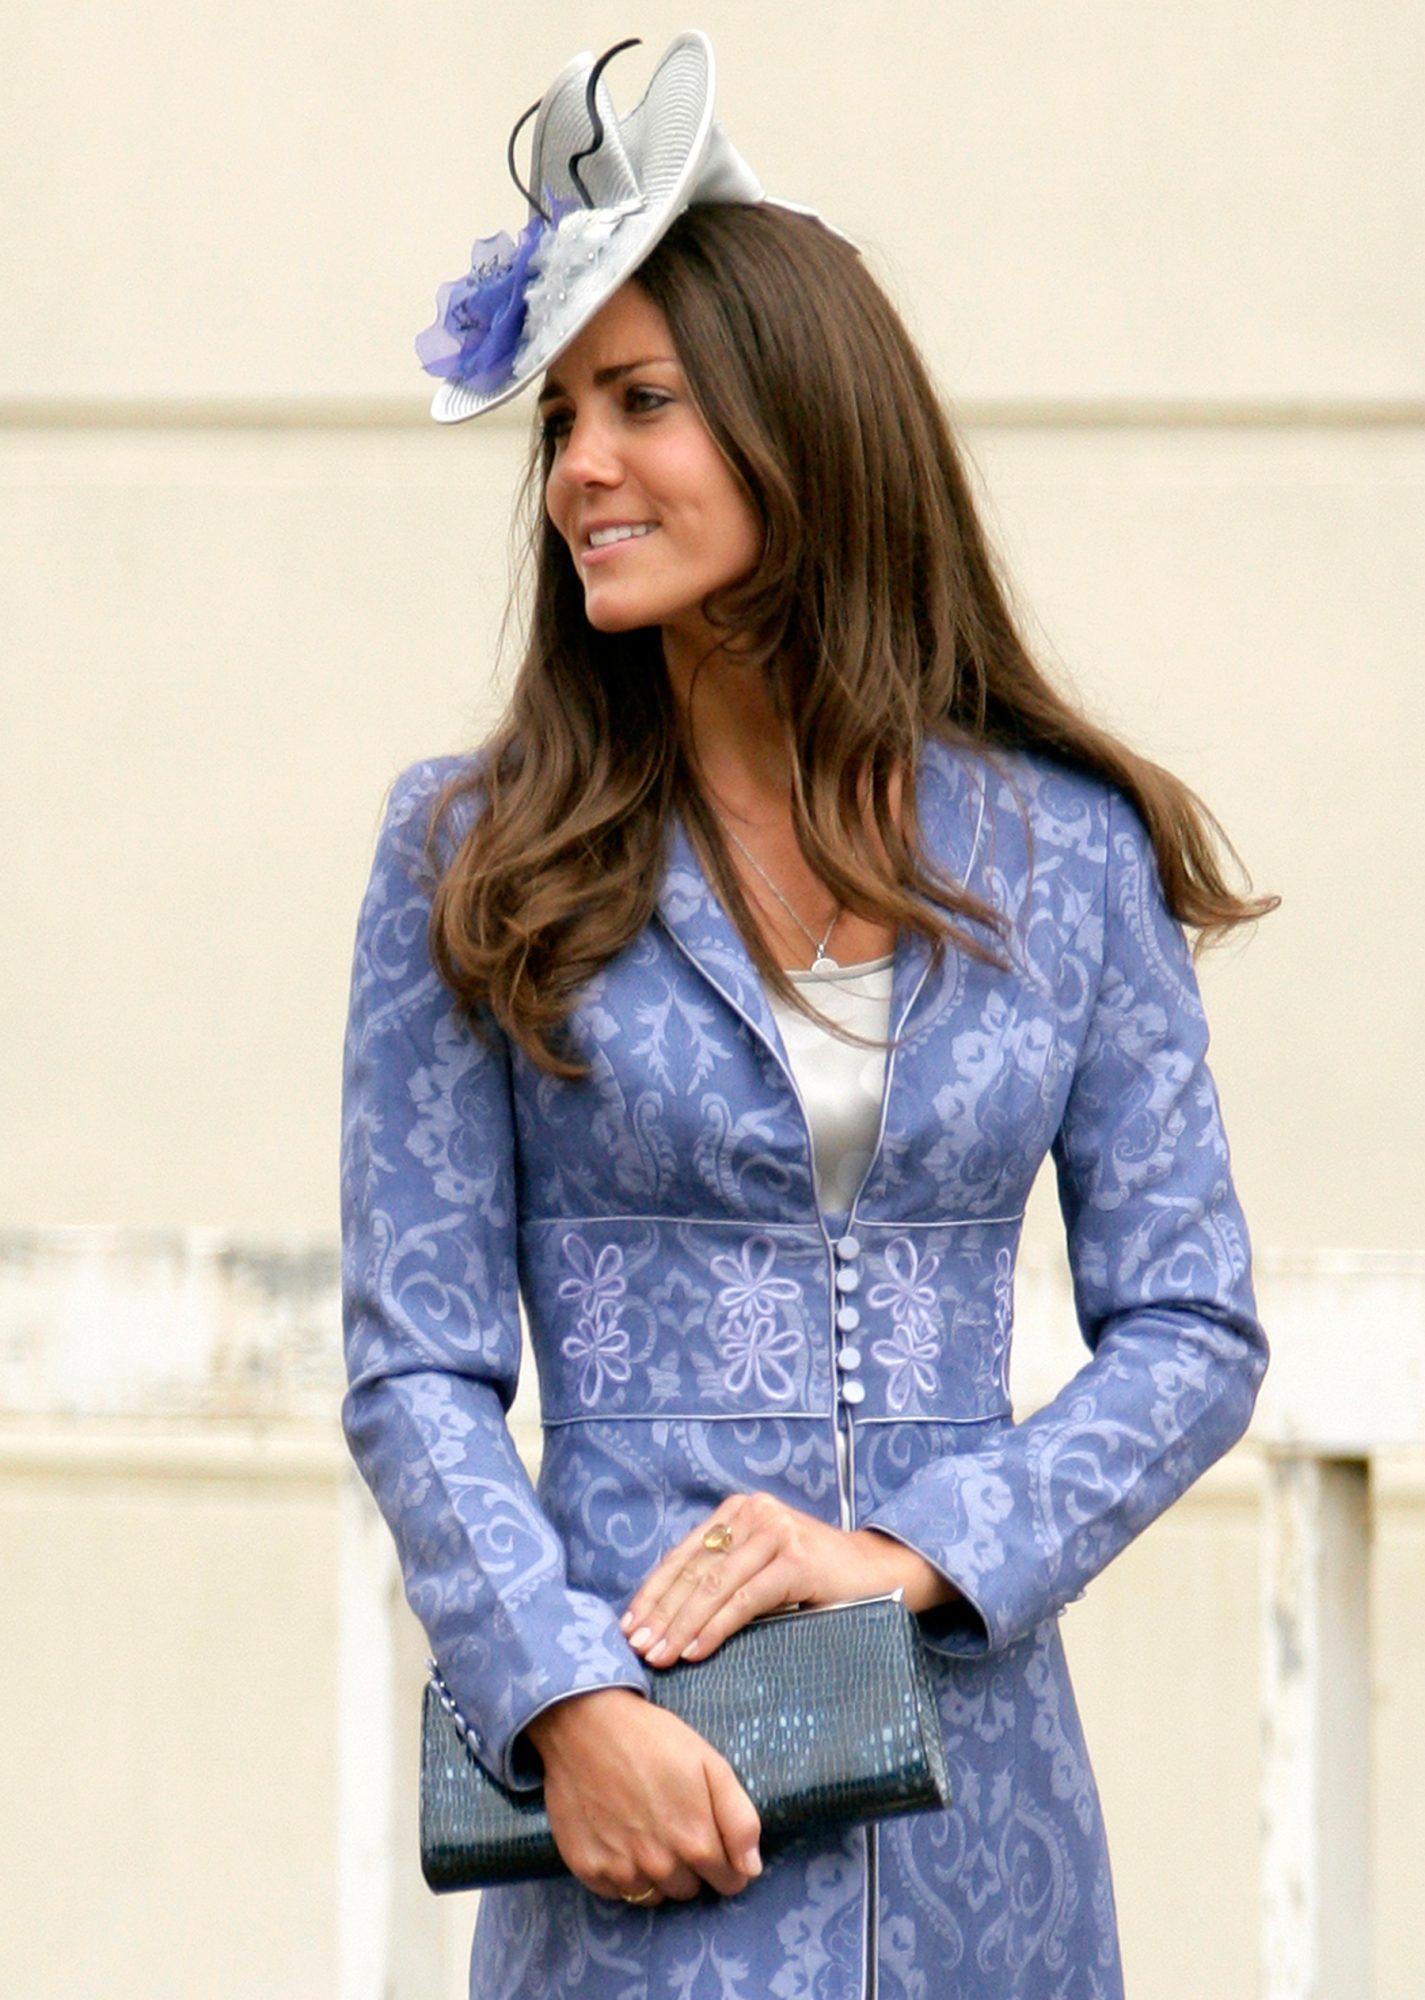 Royals Attend Nicholas Van Cutsem And Alice Hadden-Paton's Wedding